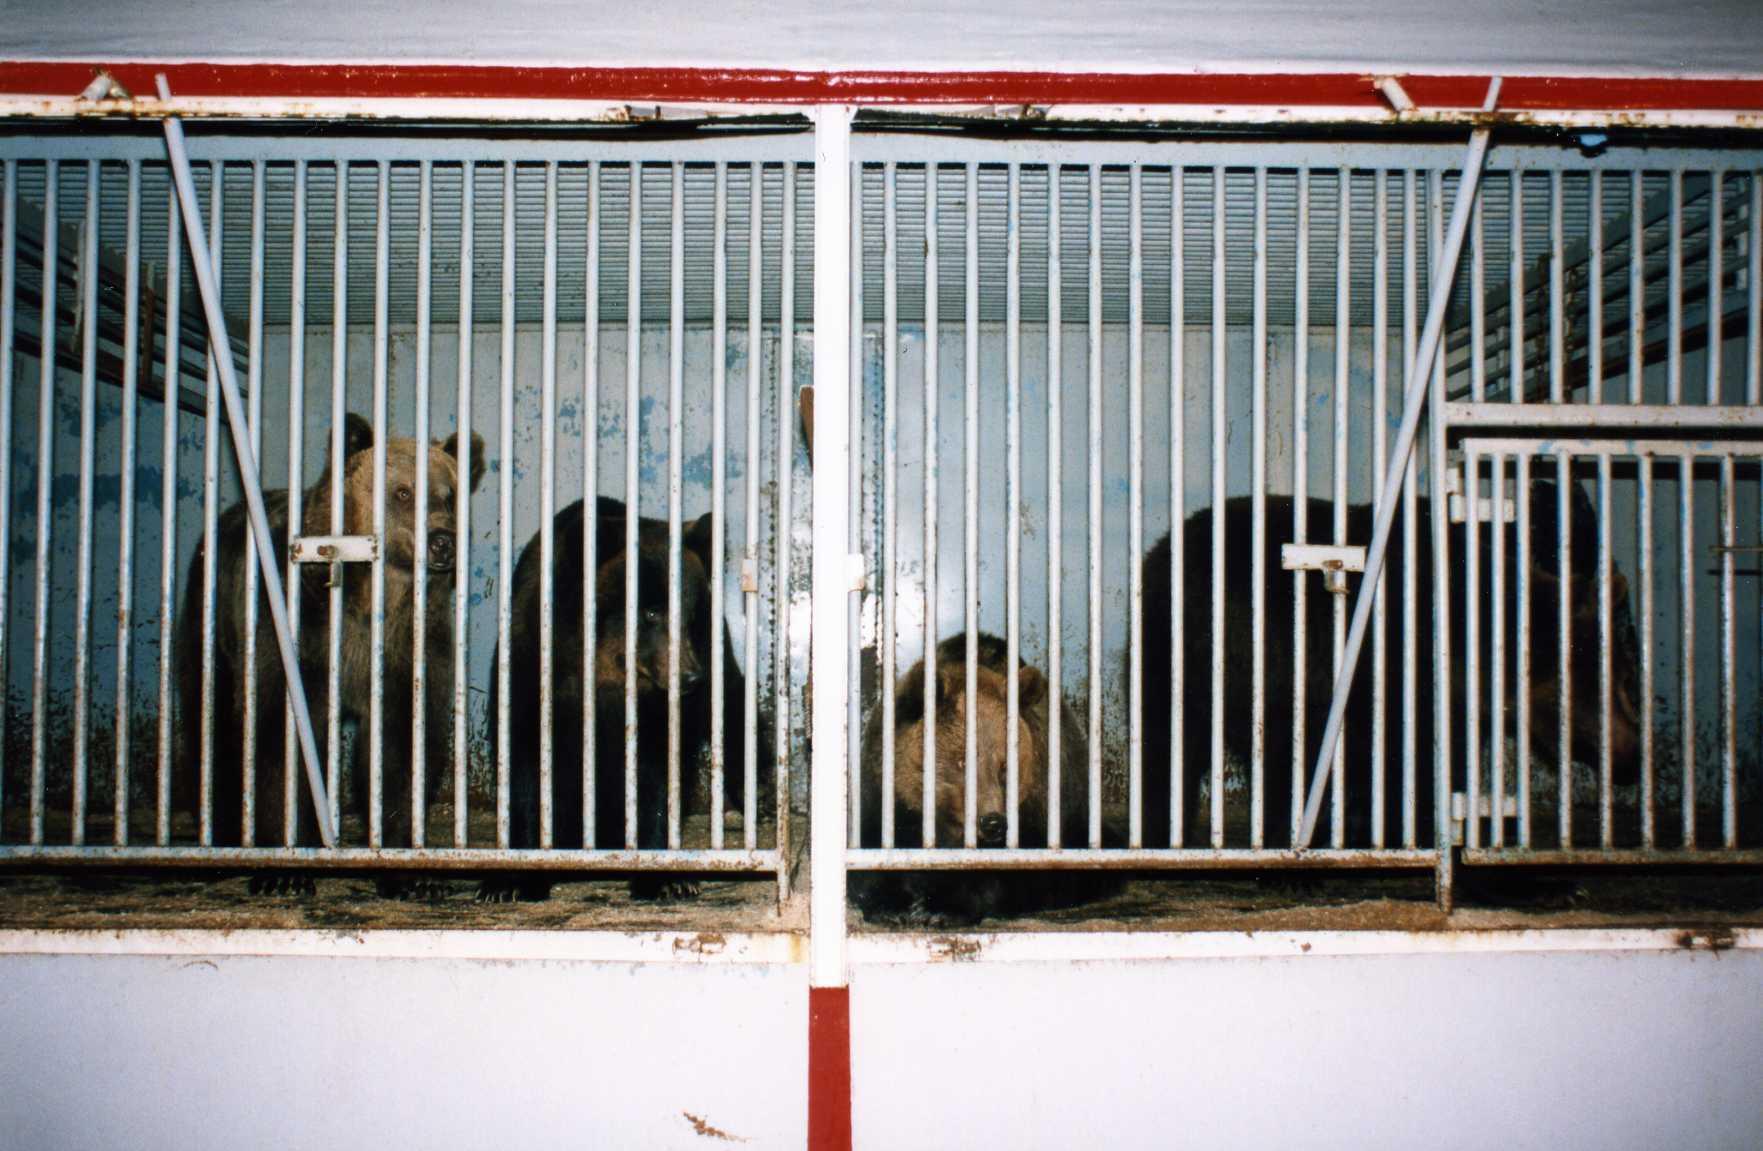 caged circus bears